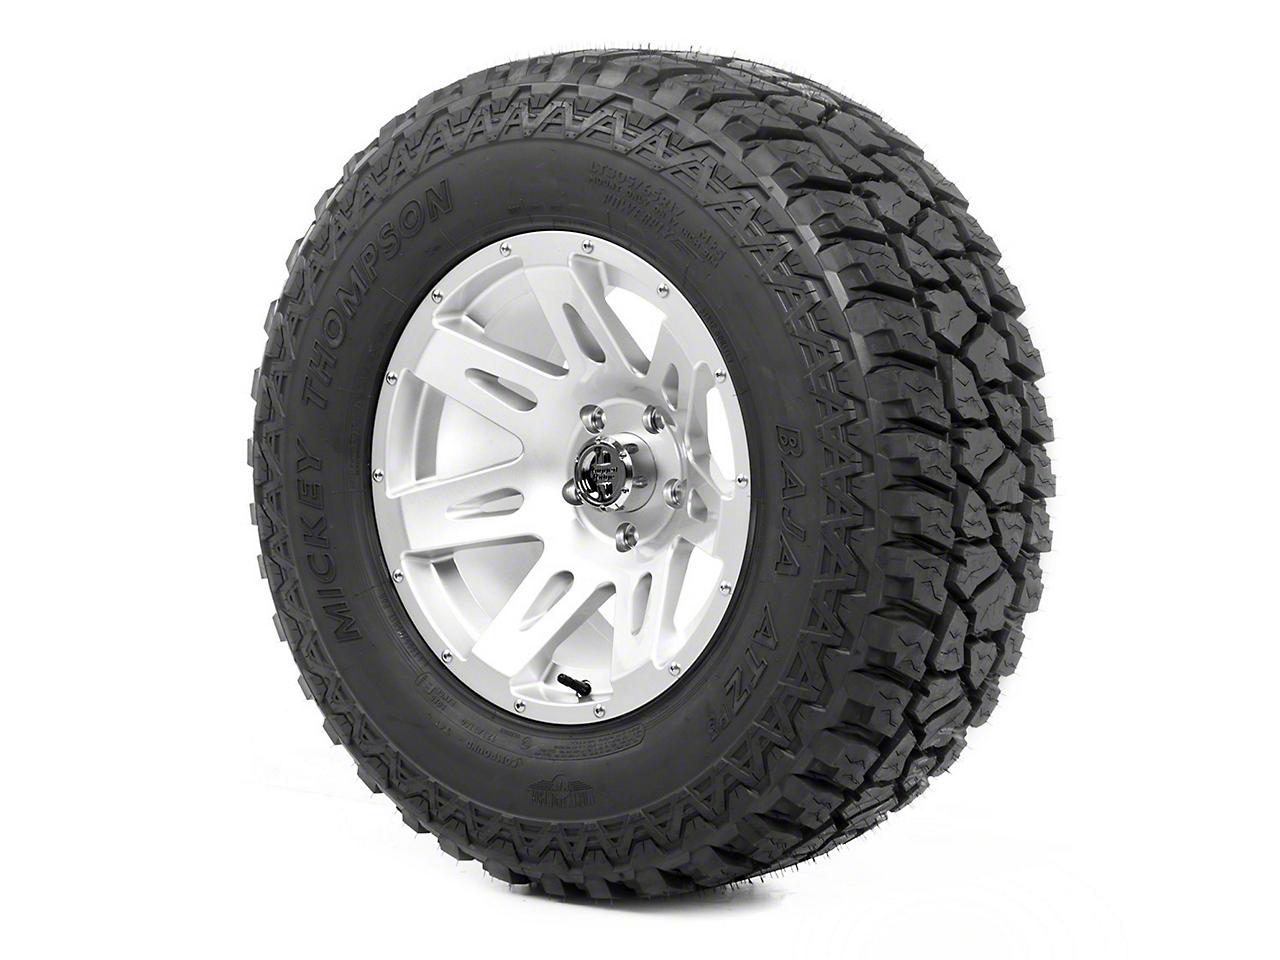 Rugged Ridge XHD Wheel 17x9 Silver and Mickey Thompson ATZ P3 305/65R17 Tire (13-18 Jeep Wrangler JK; 2018 Jeep Wrangler JL)